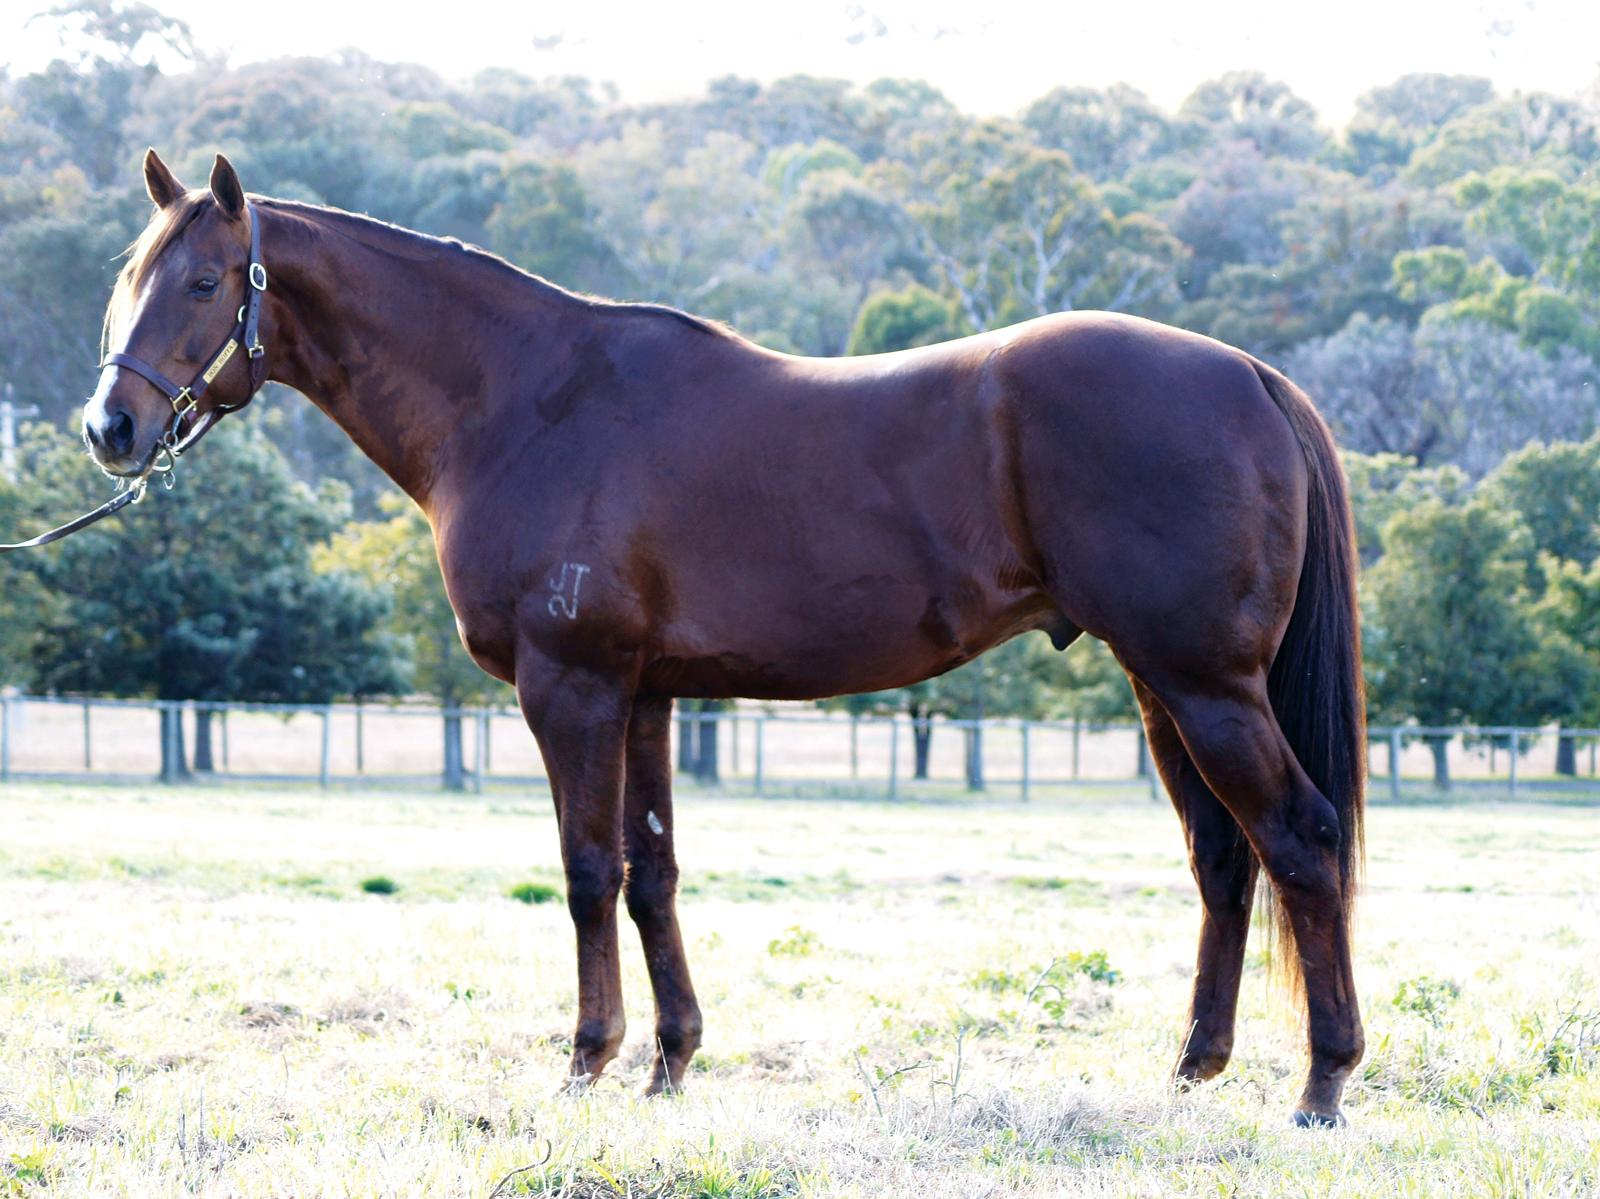 https://www.stallions.com.au/wp-content/uploads/2020/01/Bon_Hoffa_2019.jpg